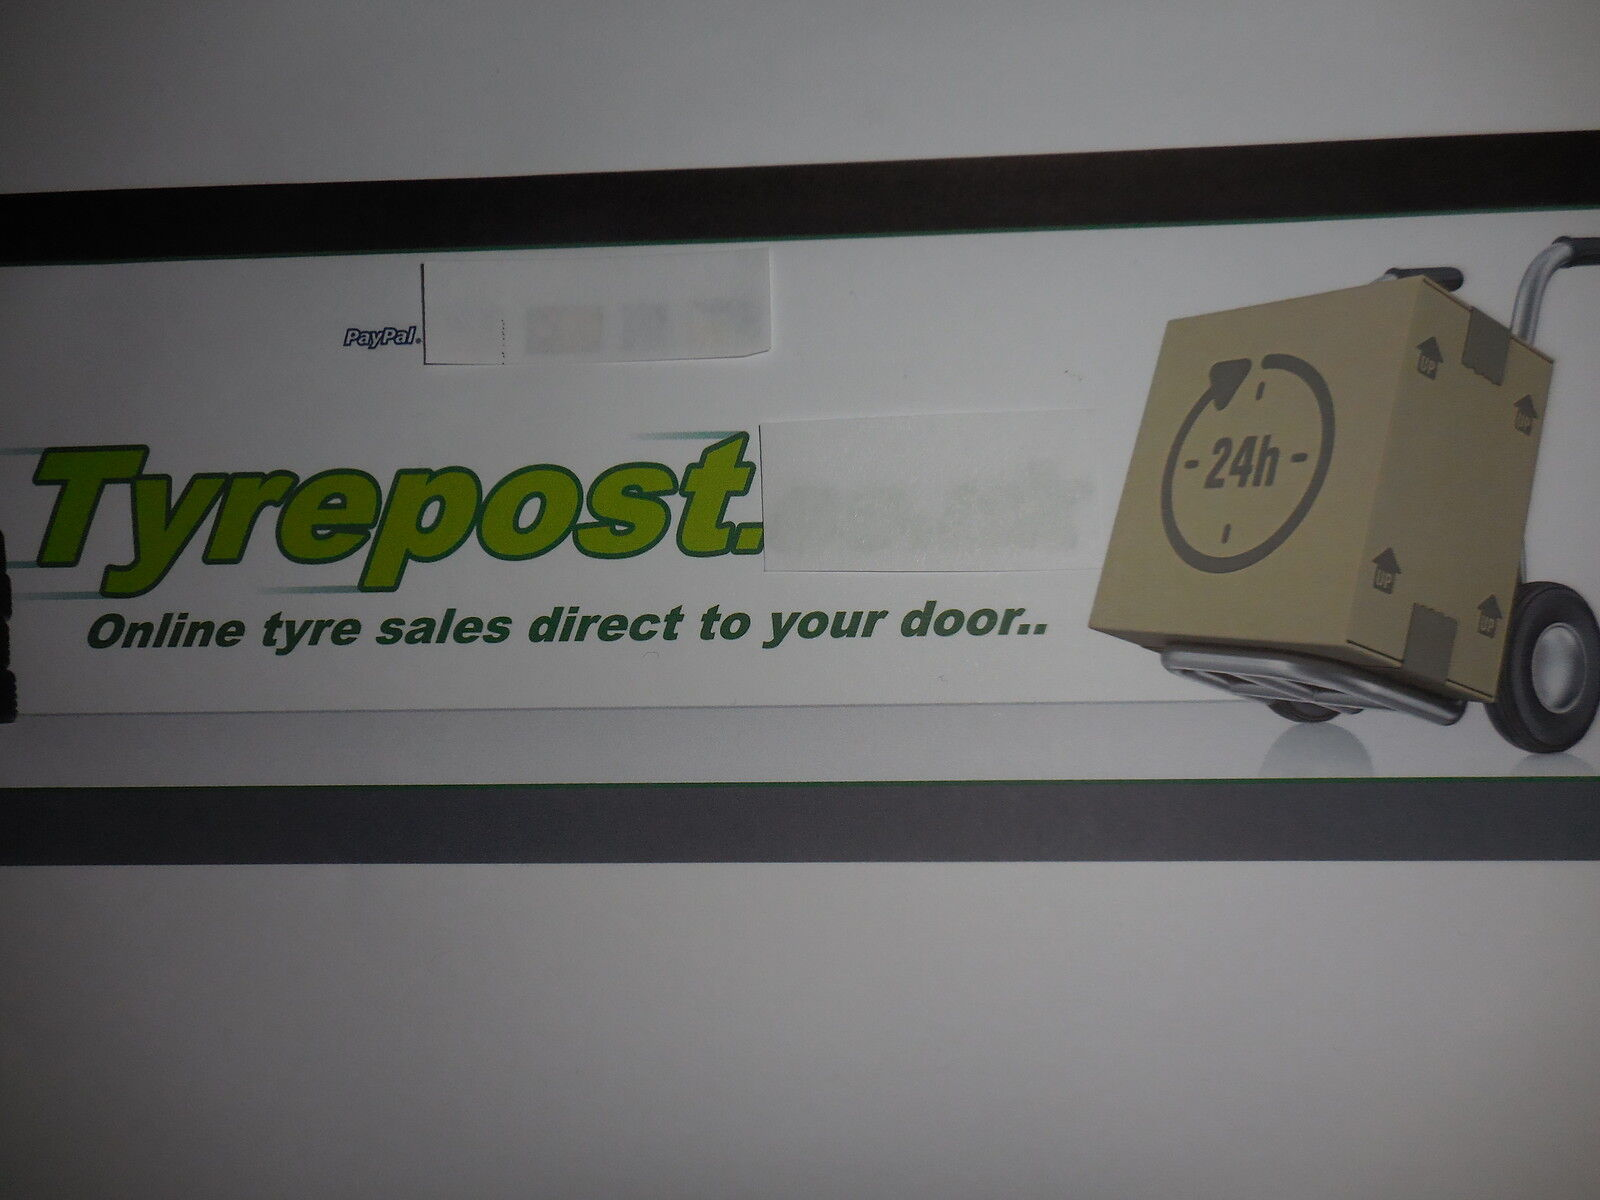 tyre-post